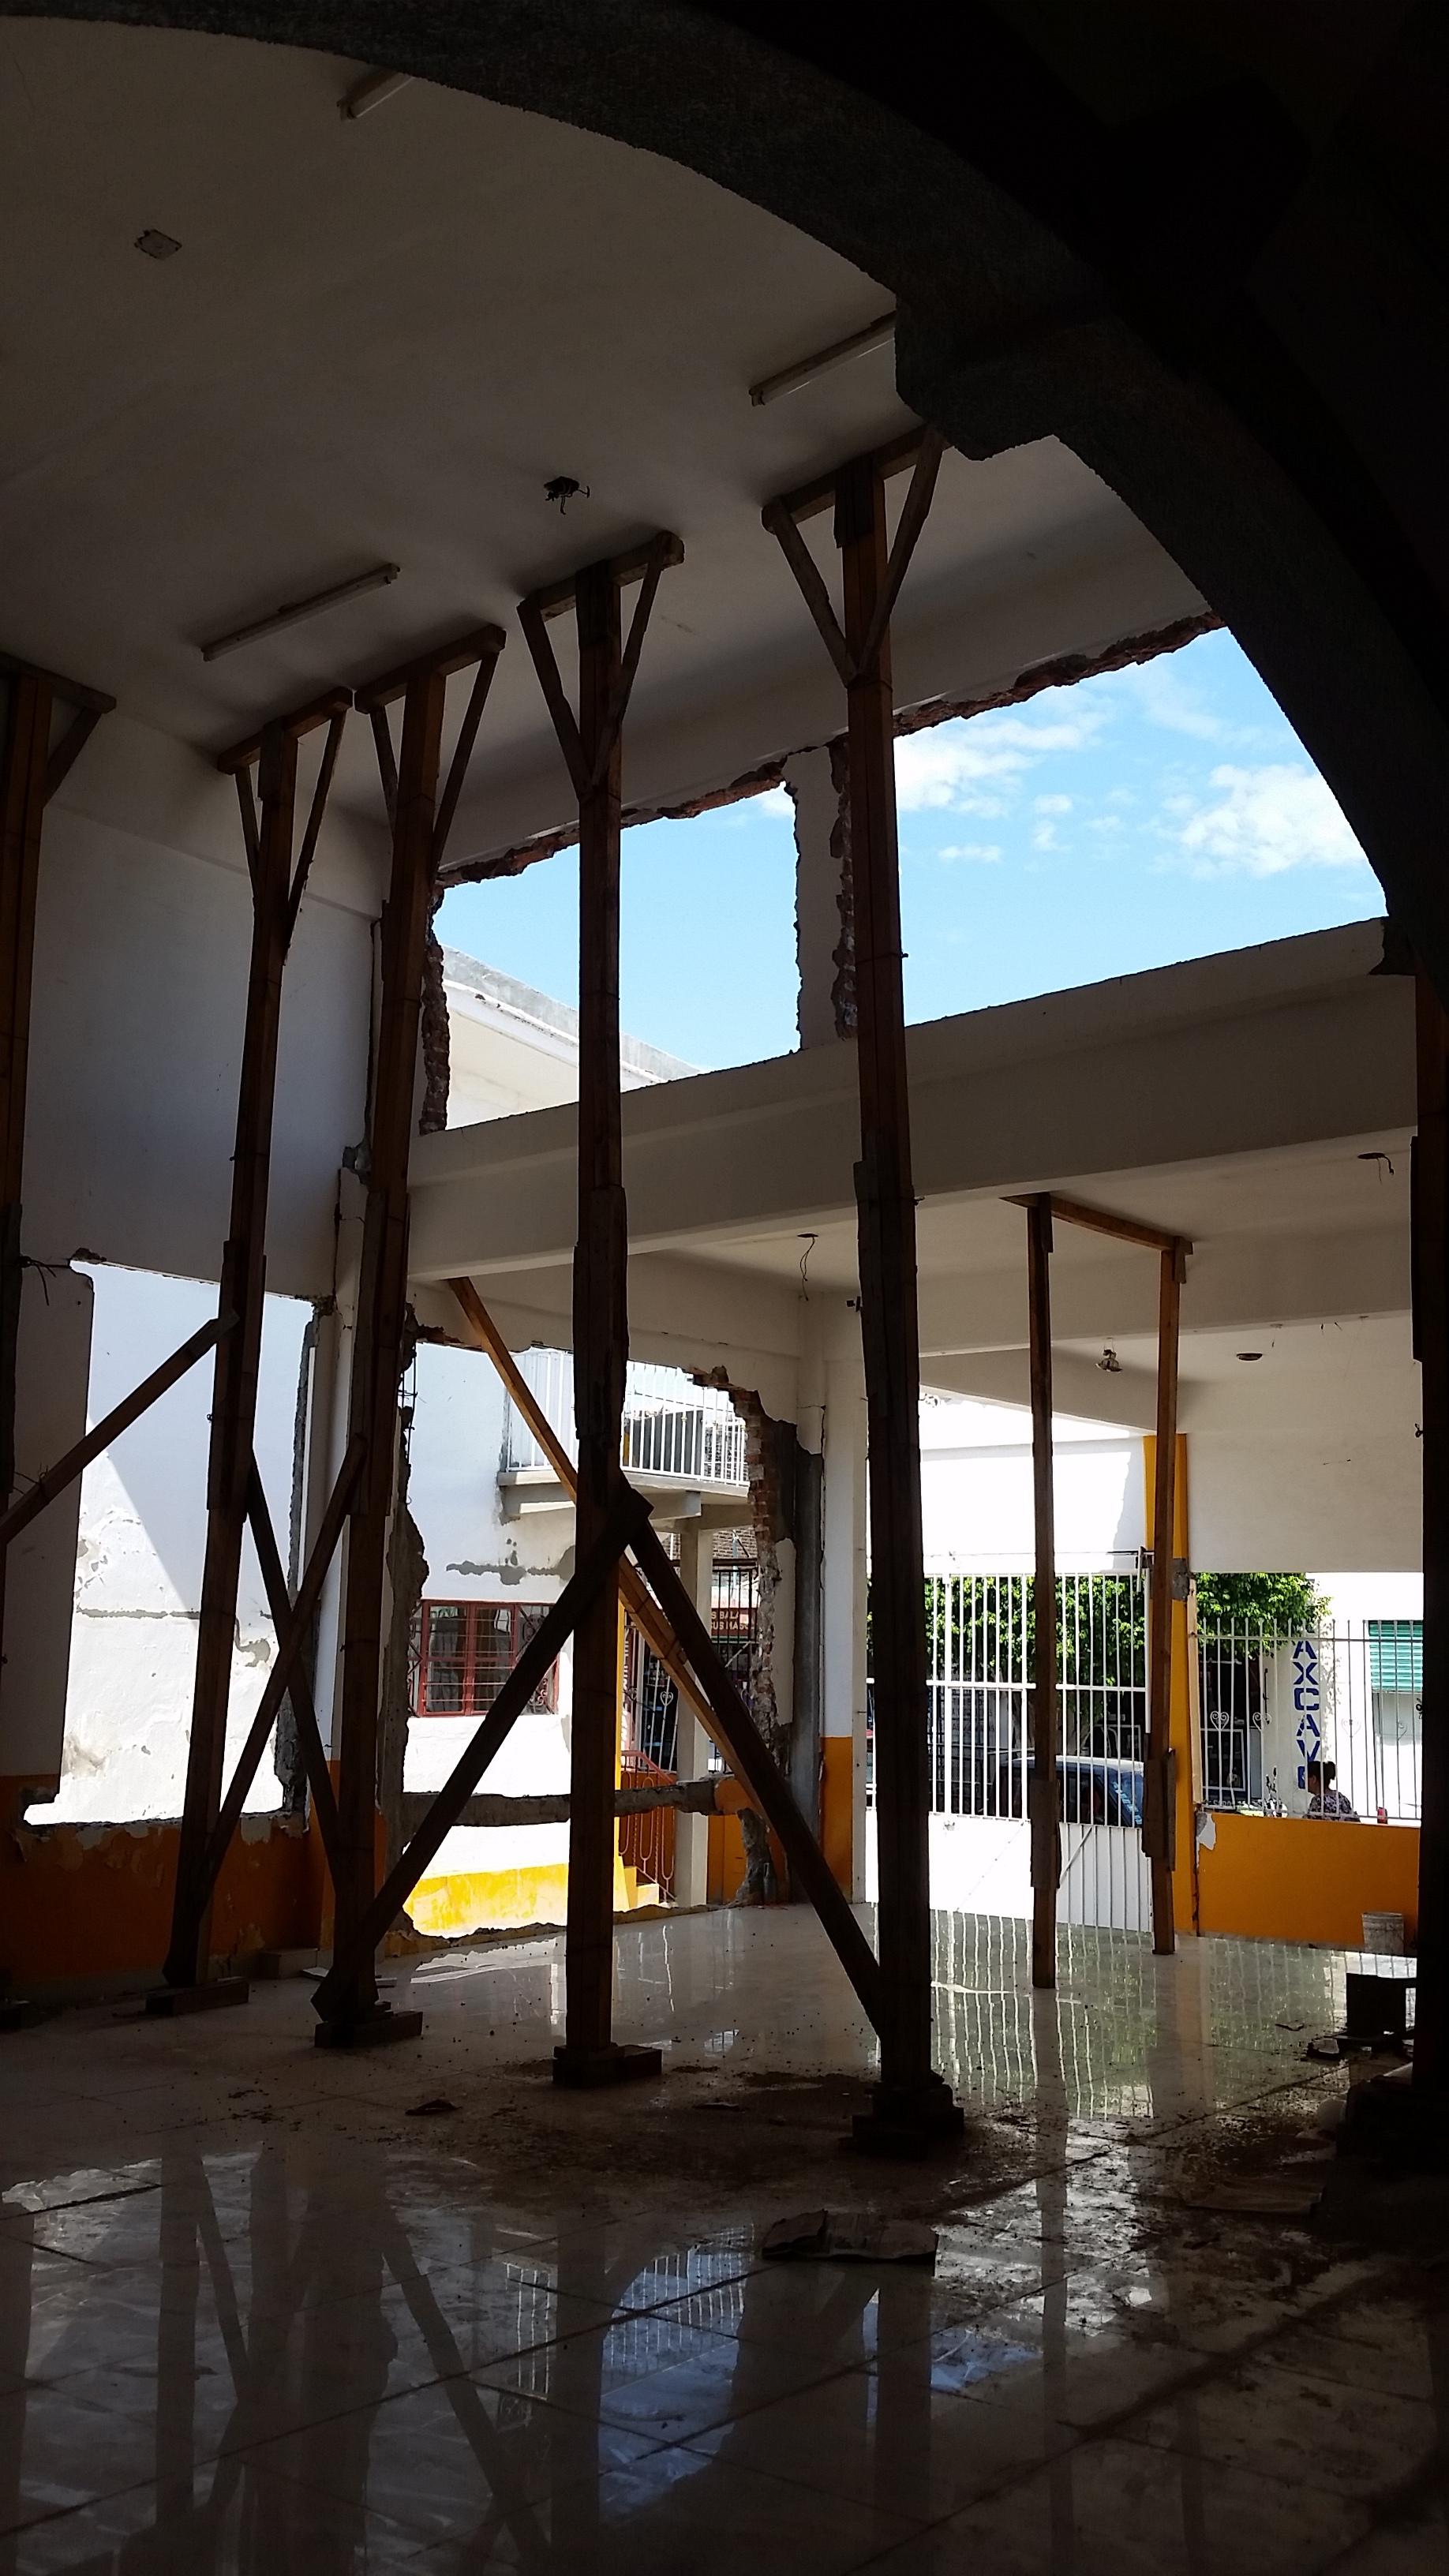 Mexico_Cara_McKinney_20180907_154033.jpg